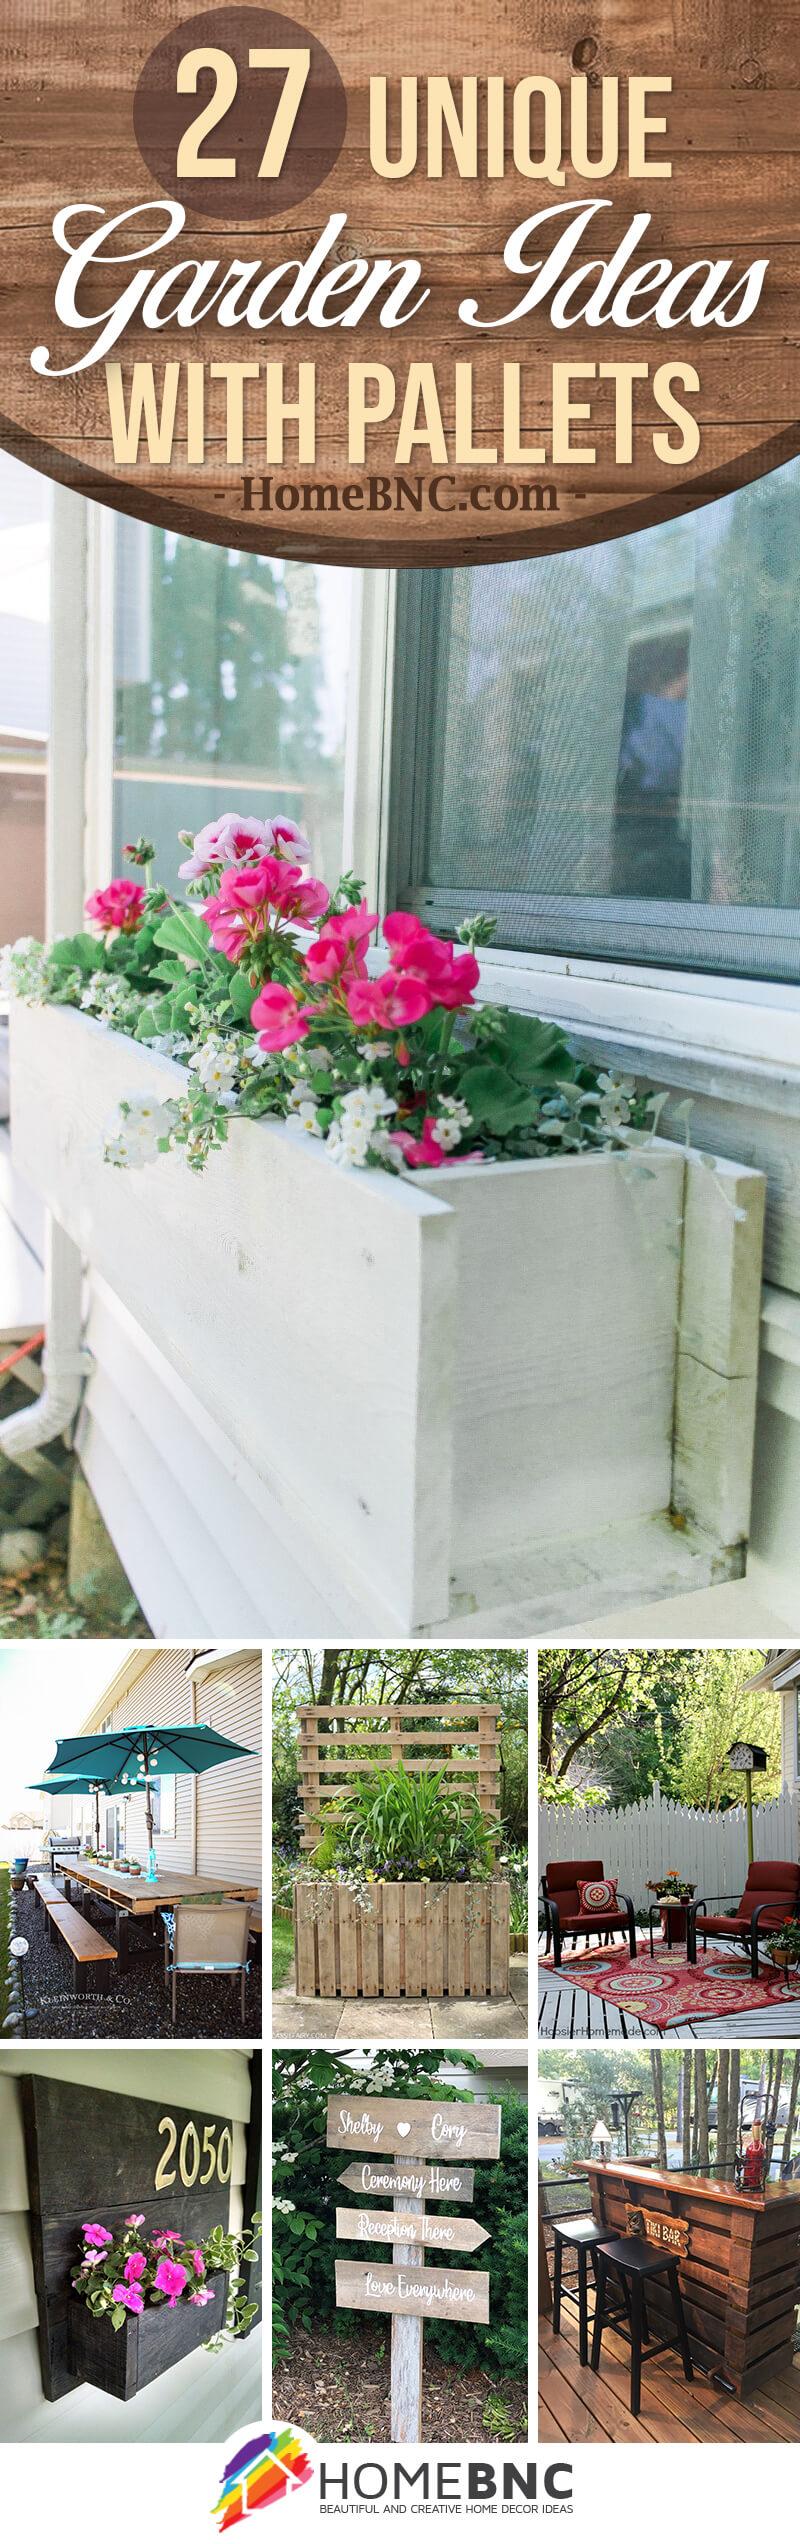 Garden Ideas with Pallets